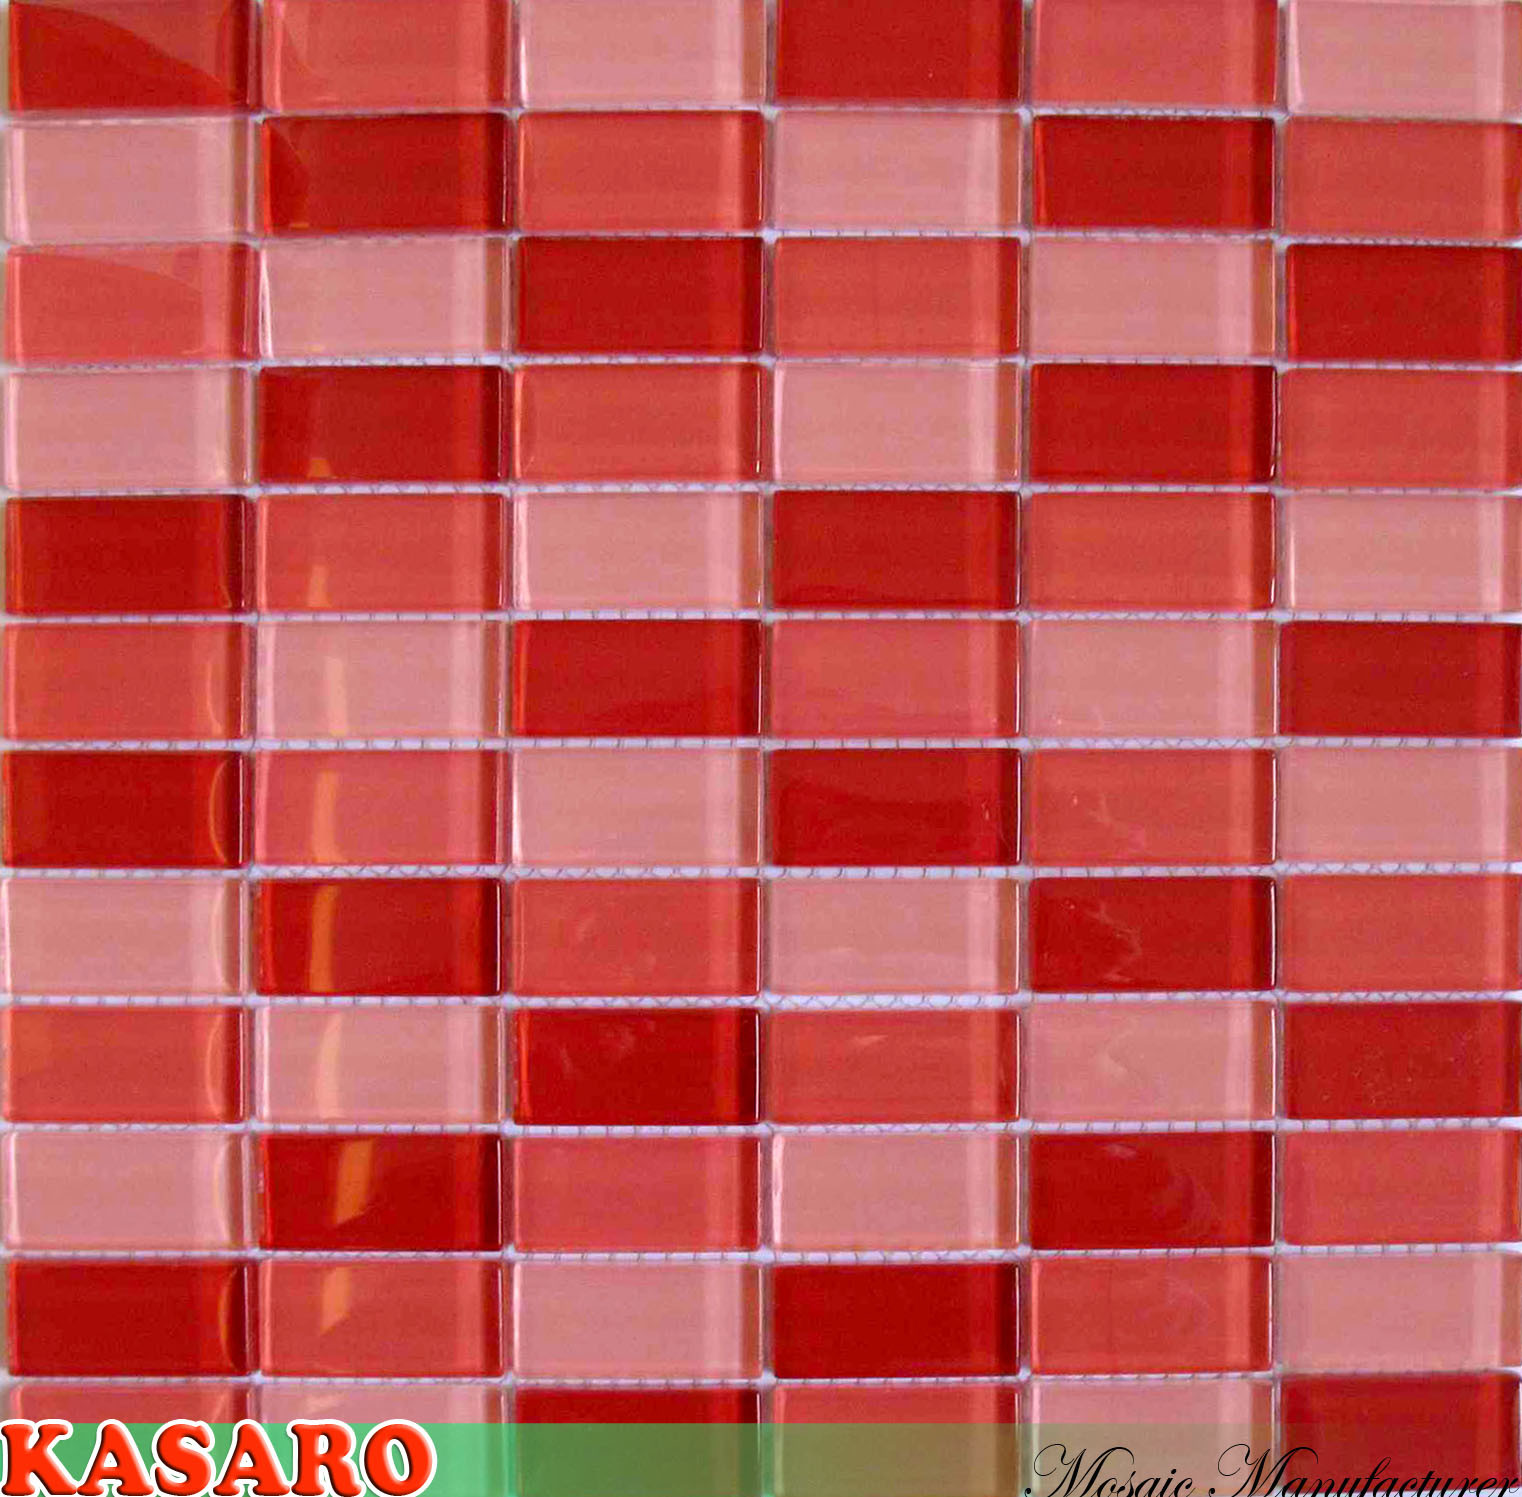 china red glass mosaic tile kitchen backsplash wall tile ksl subway mosaic red glass kitchen backsplash tile traditional kitchen